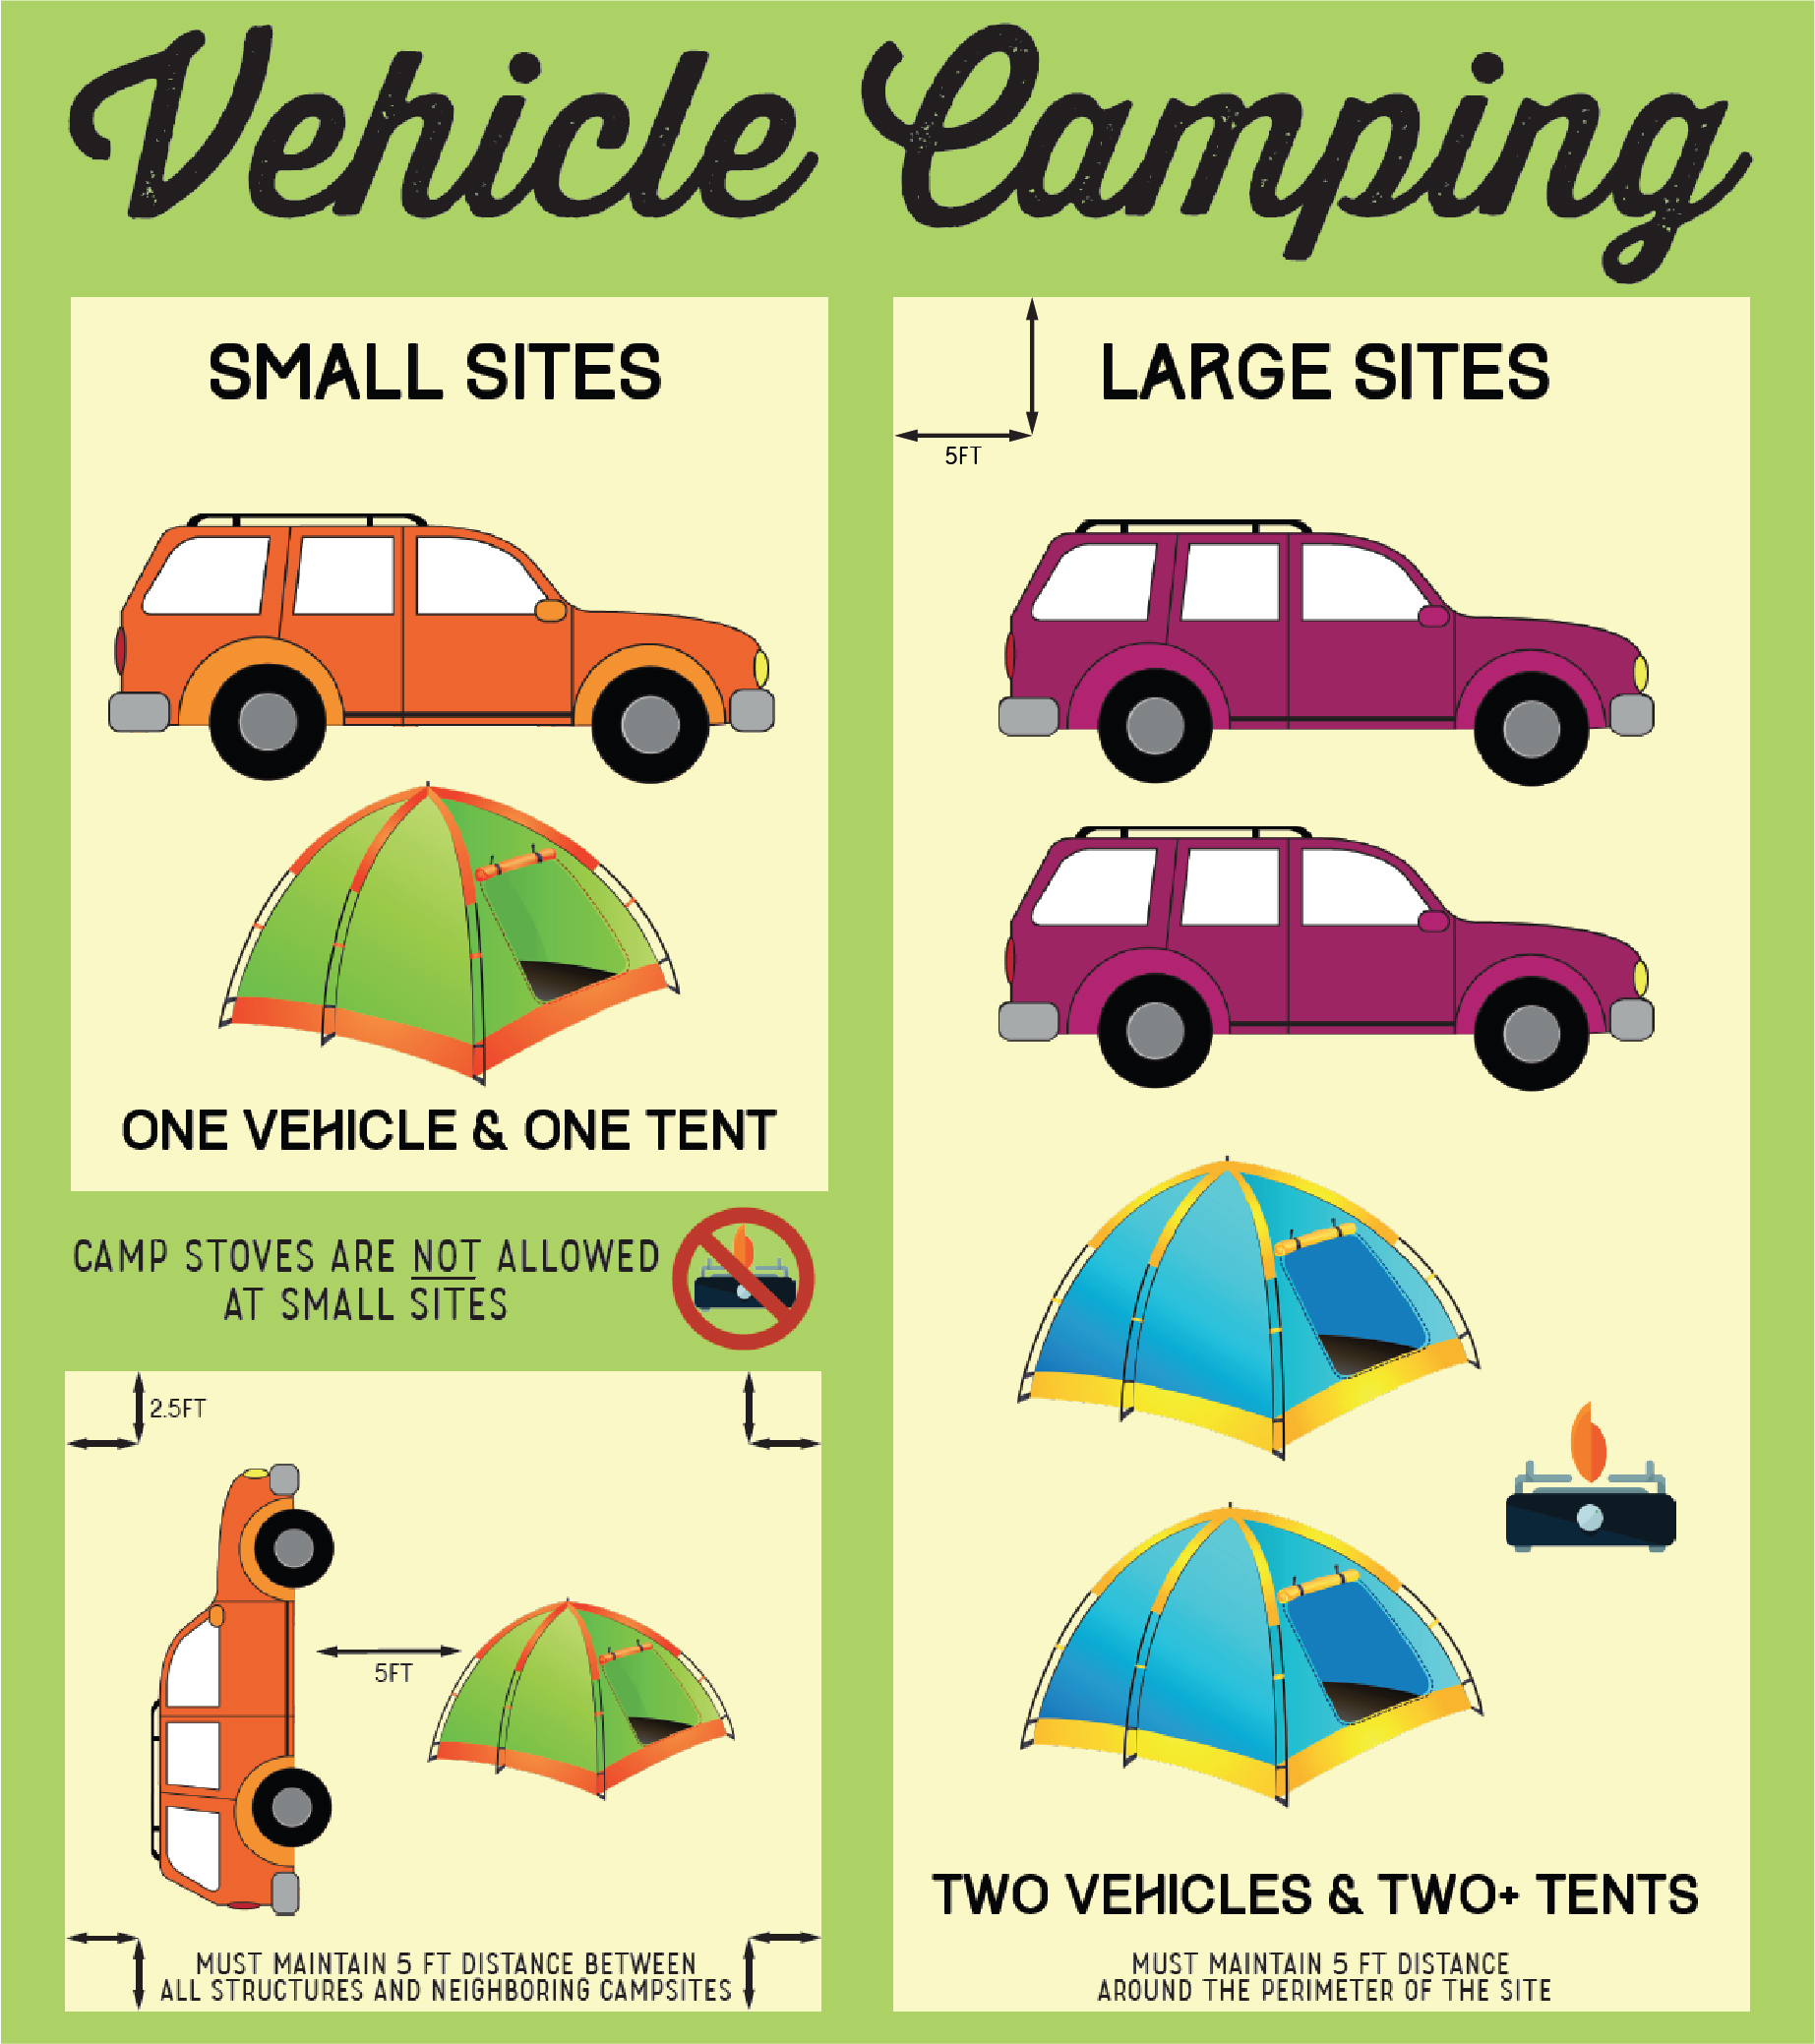 Vehicle_Camping_Regulations3-01.jpg